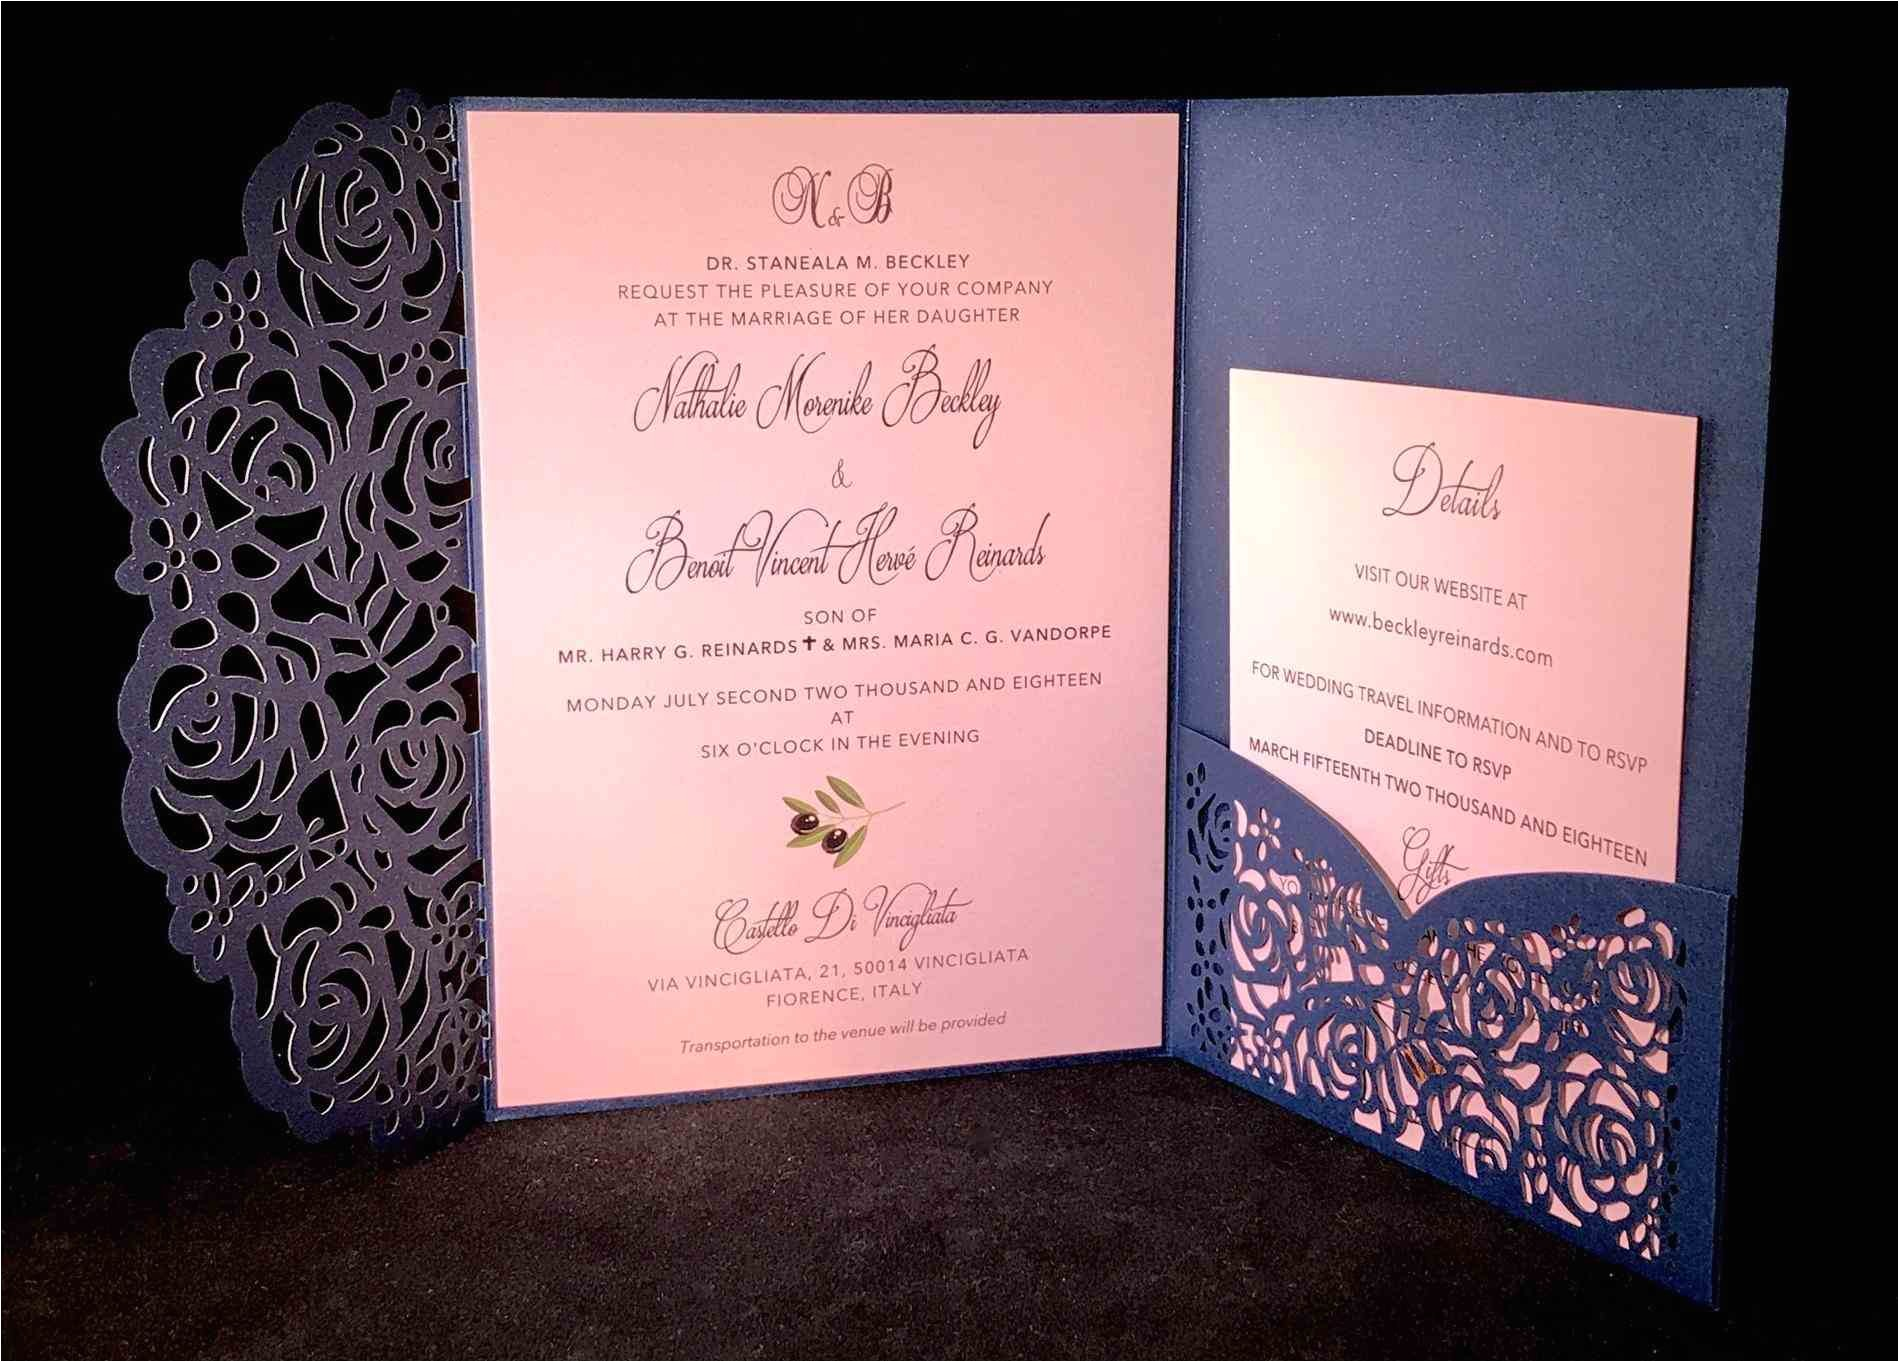 undangan images on rhsavingbellevuecom fresh beautiful vietnamese fresh laser cut wedding invitations nyc beautiful vietnamese rhsavingbellevuecom jpg